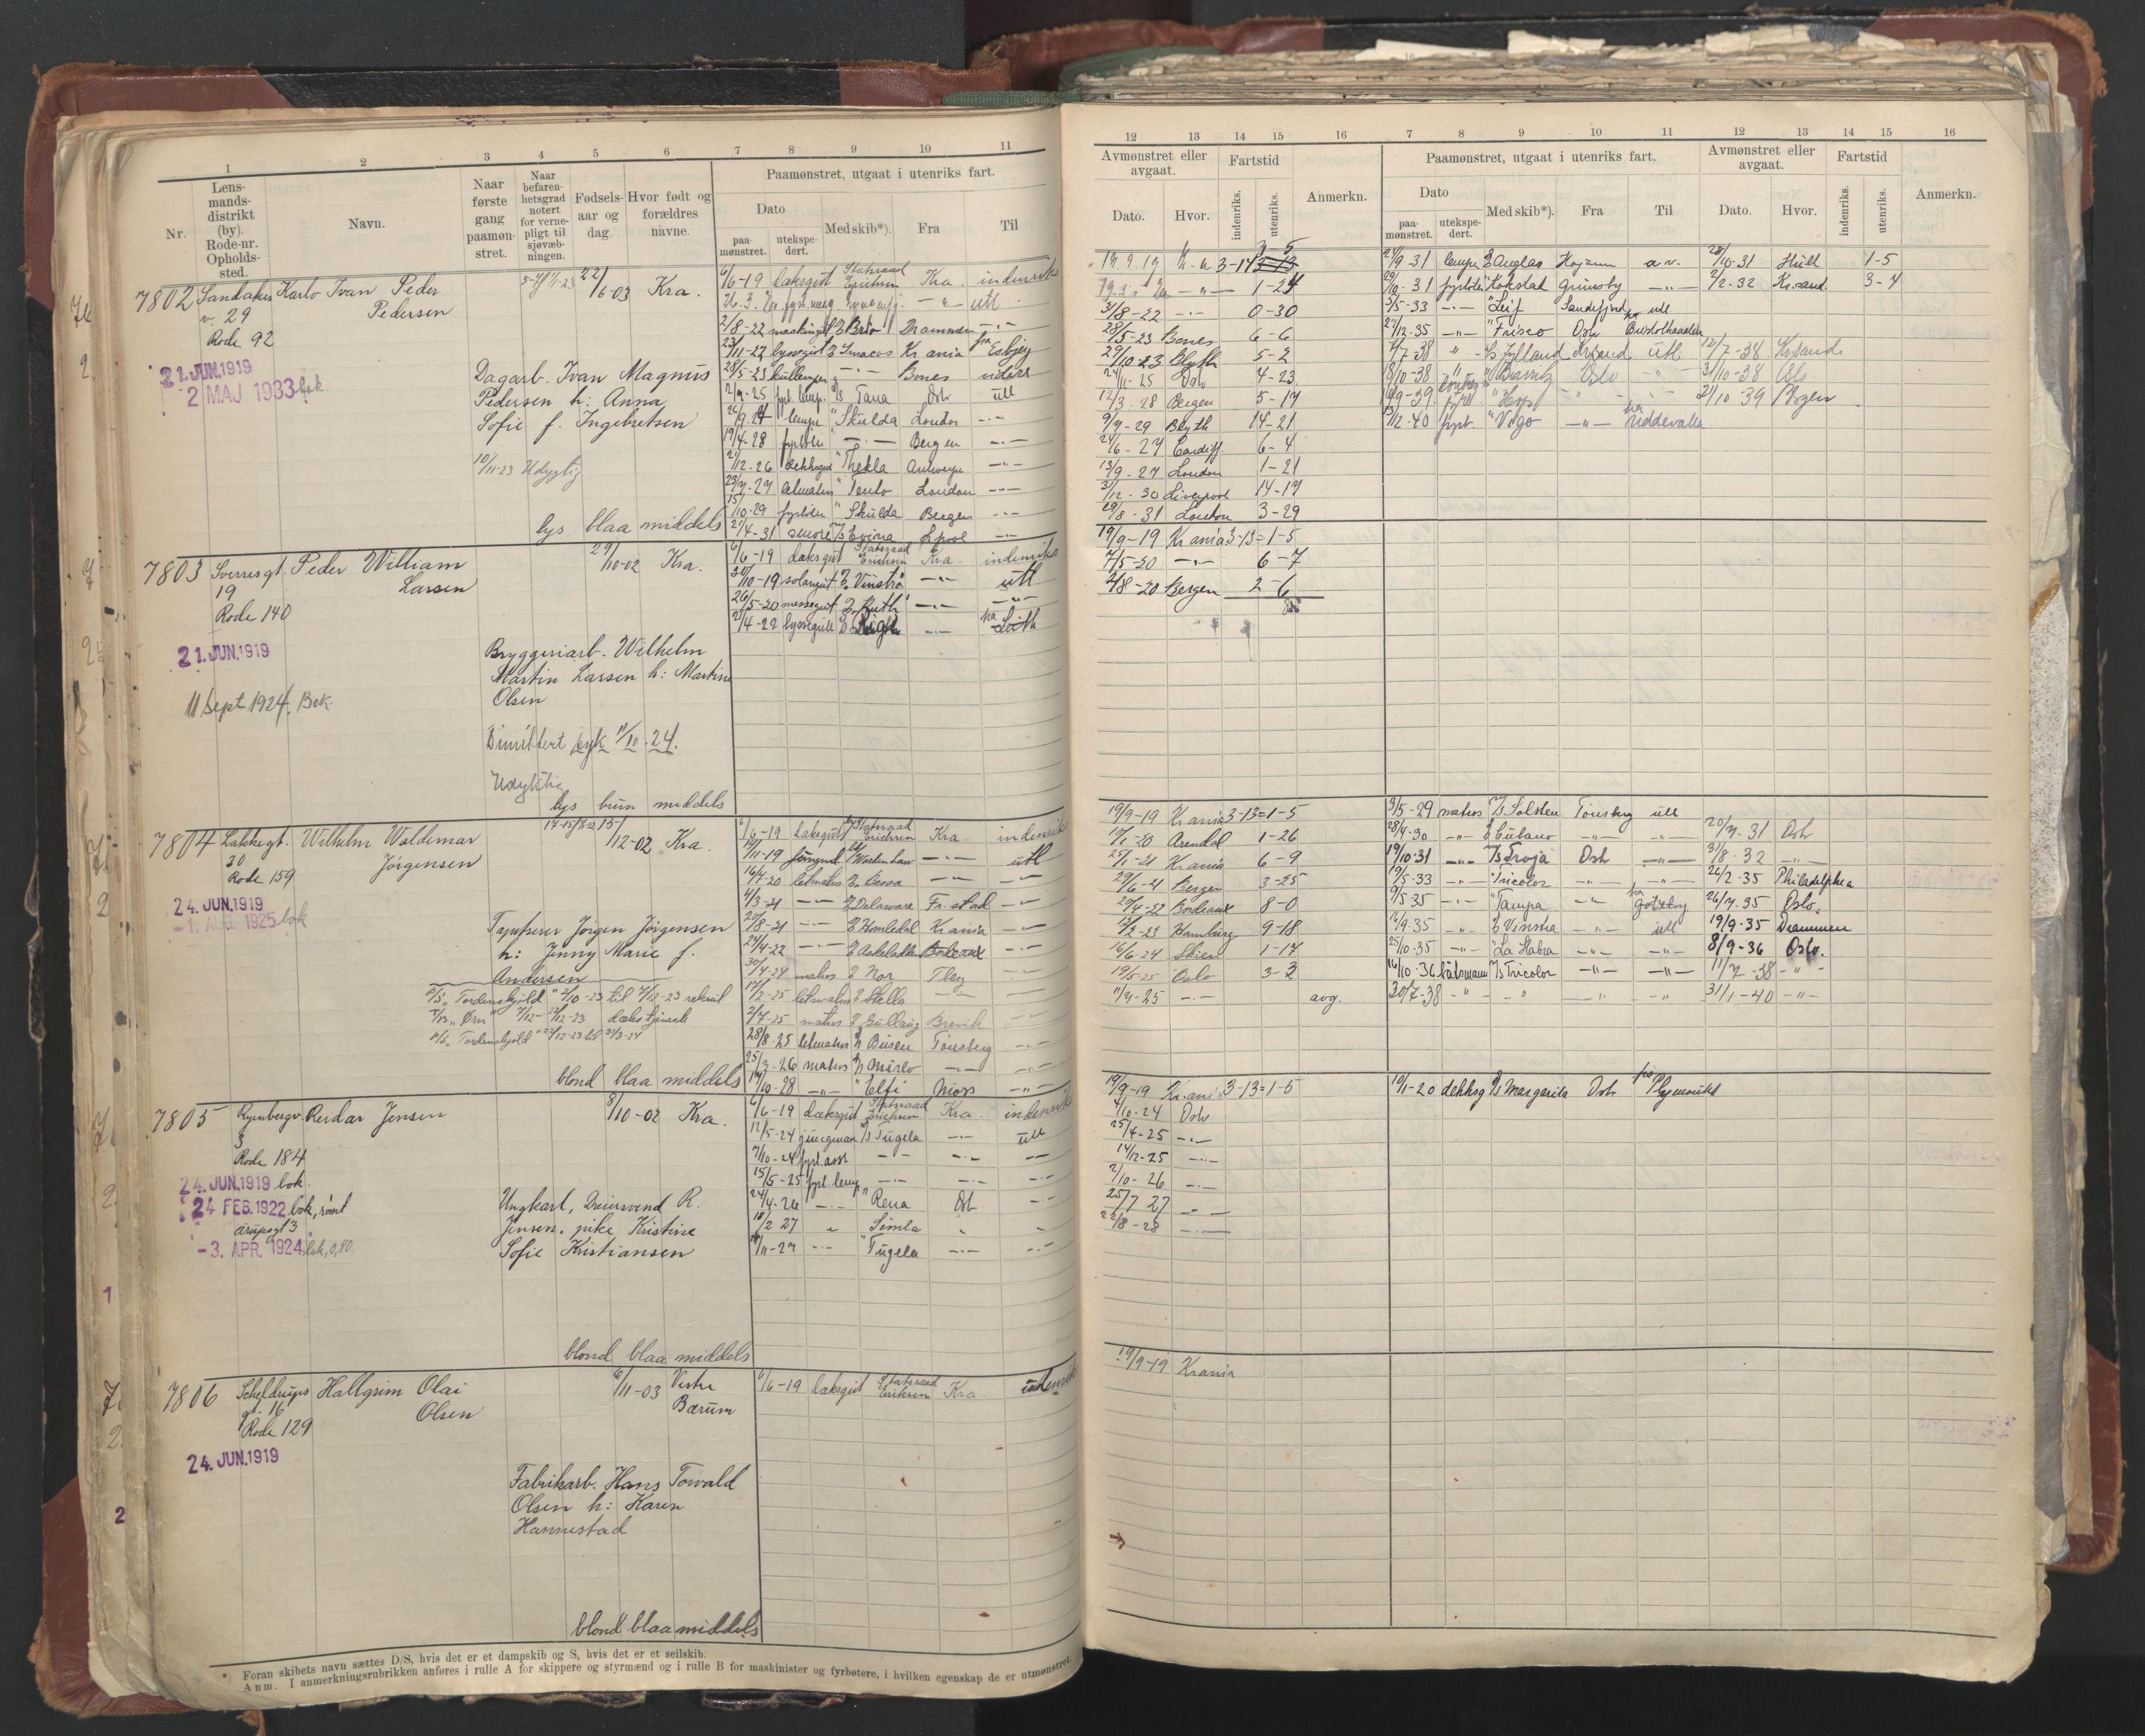 SAO, Oslo sjømannskontor, F/Fc/L0006: Hovedrulle, 1918-1930, s. 49